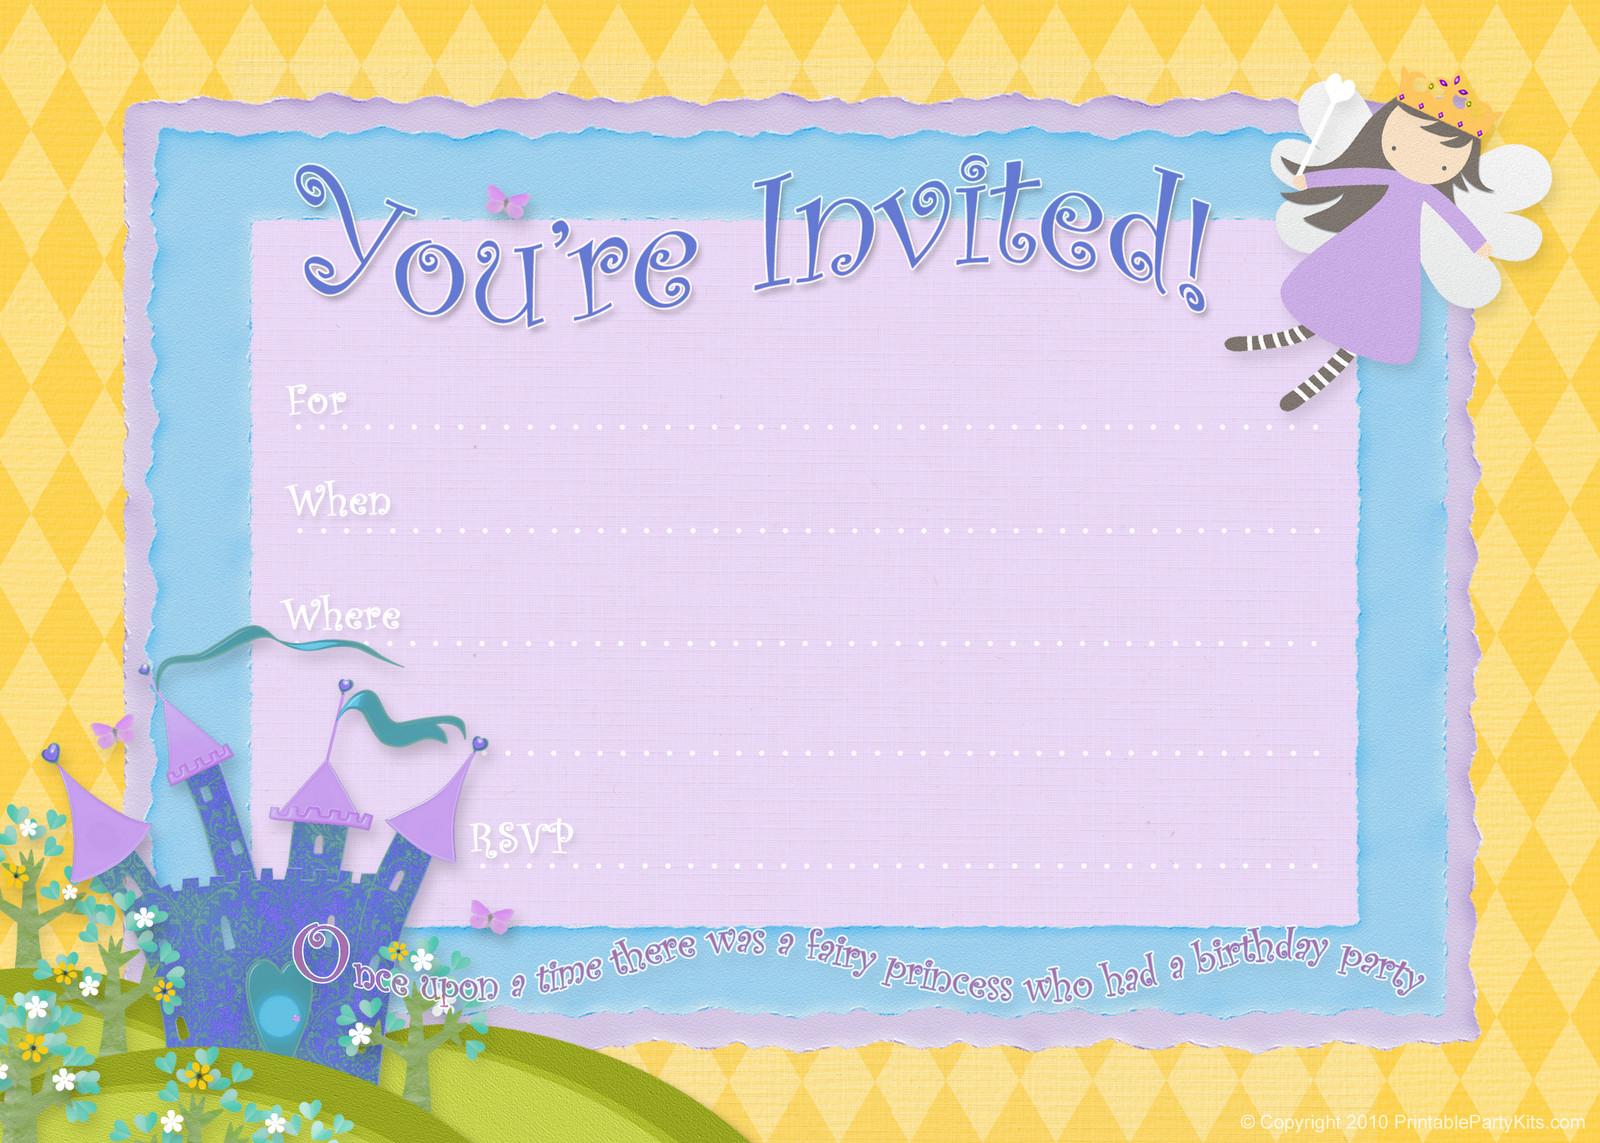 Free Templates For Birthday Invitations  Free Birthday Party Invitations – Bagvania FREE Printable